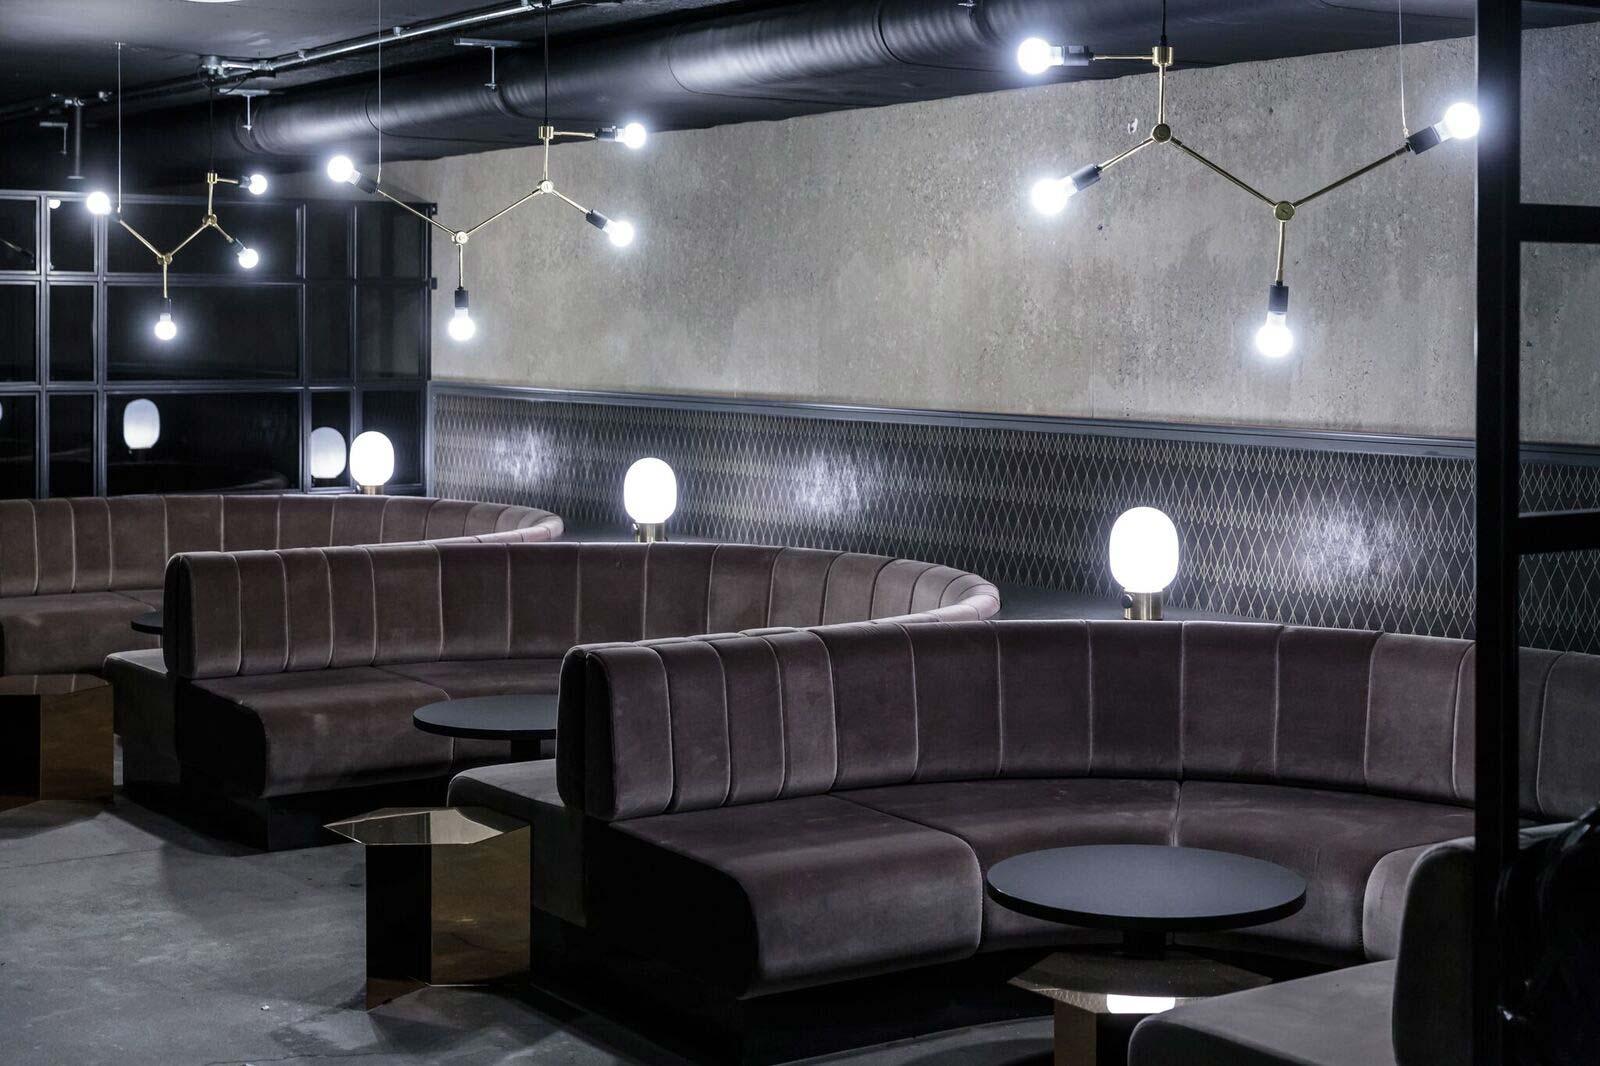 Velvet banquette seating, upholstered with fluted backs